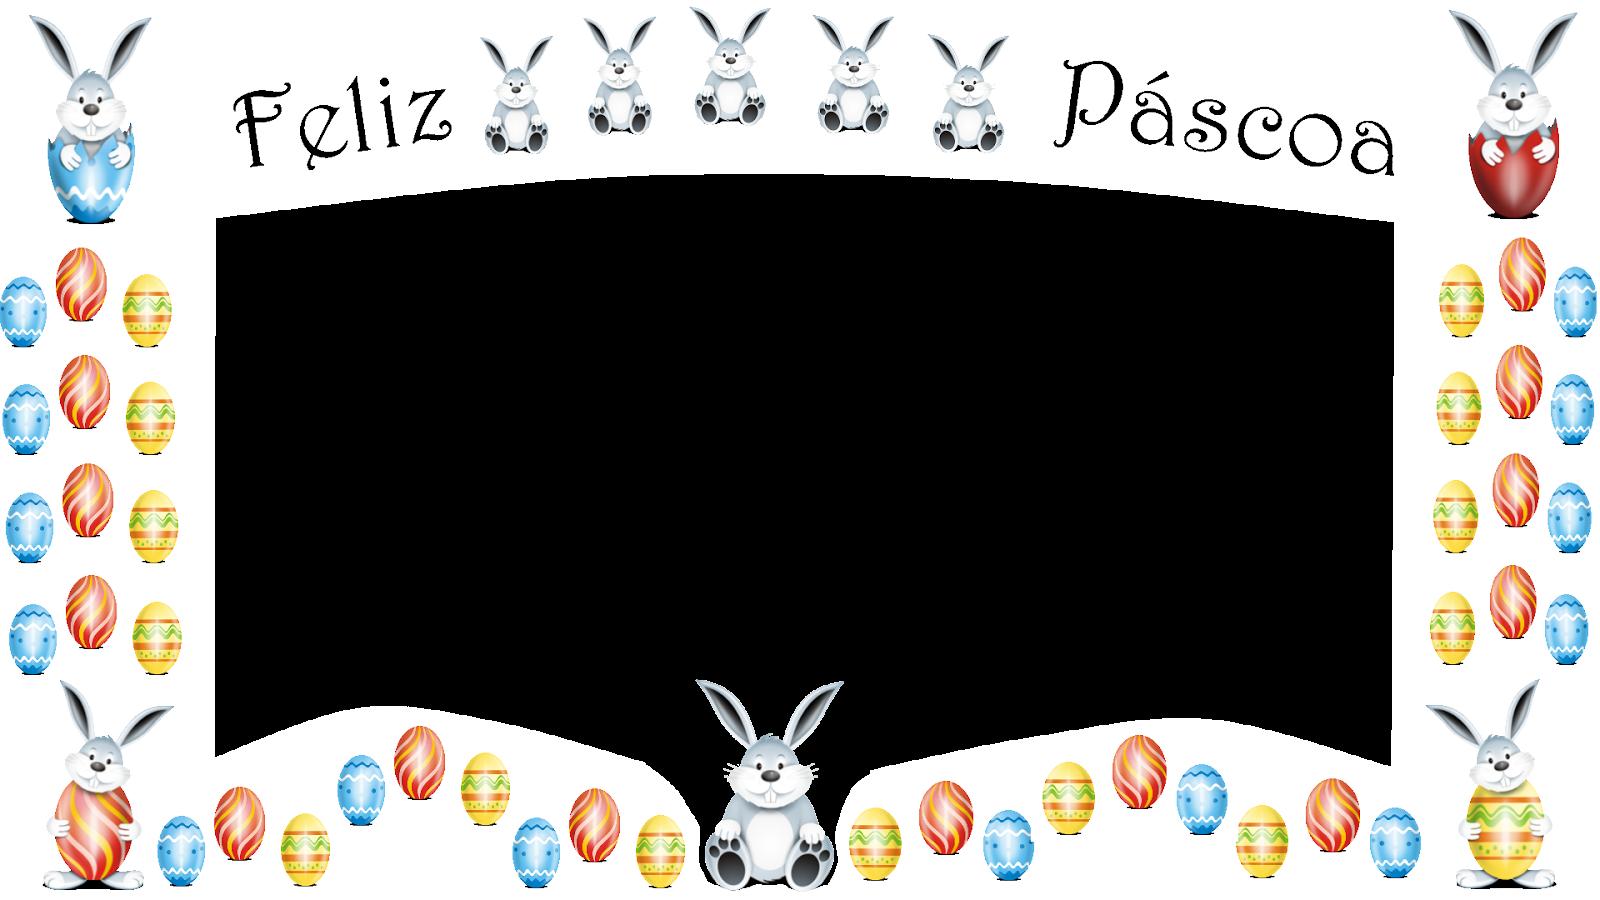 Coelhinhos e ovos-Feliz Pascoa 2 - borda branca png